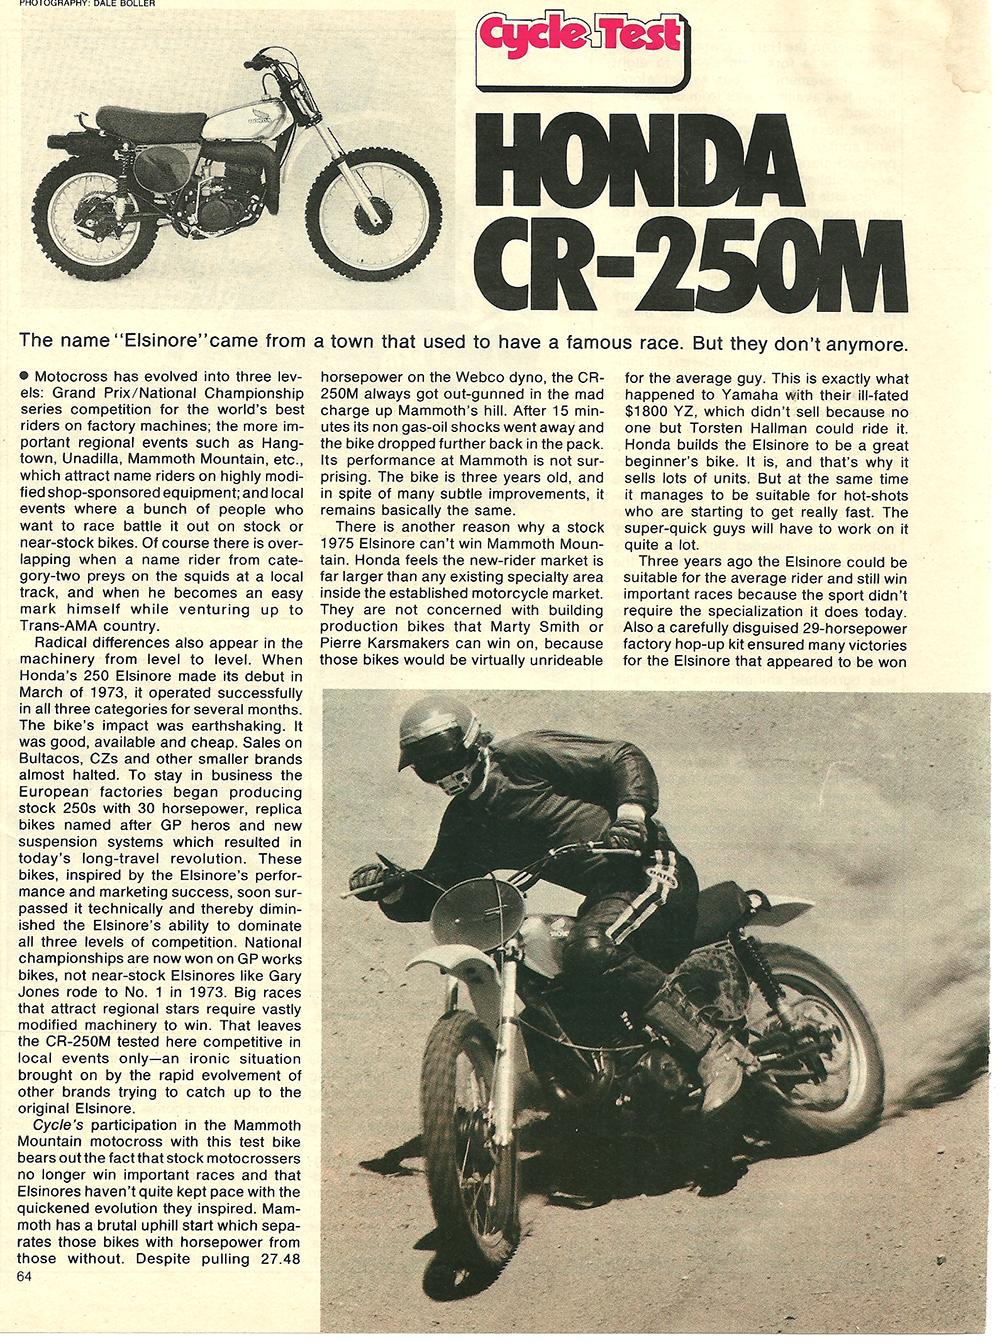 1975 Honda CR250M road test 1.png